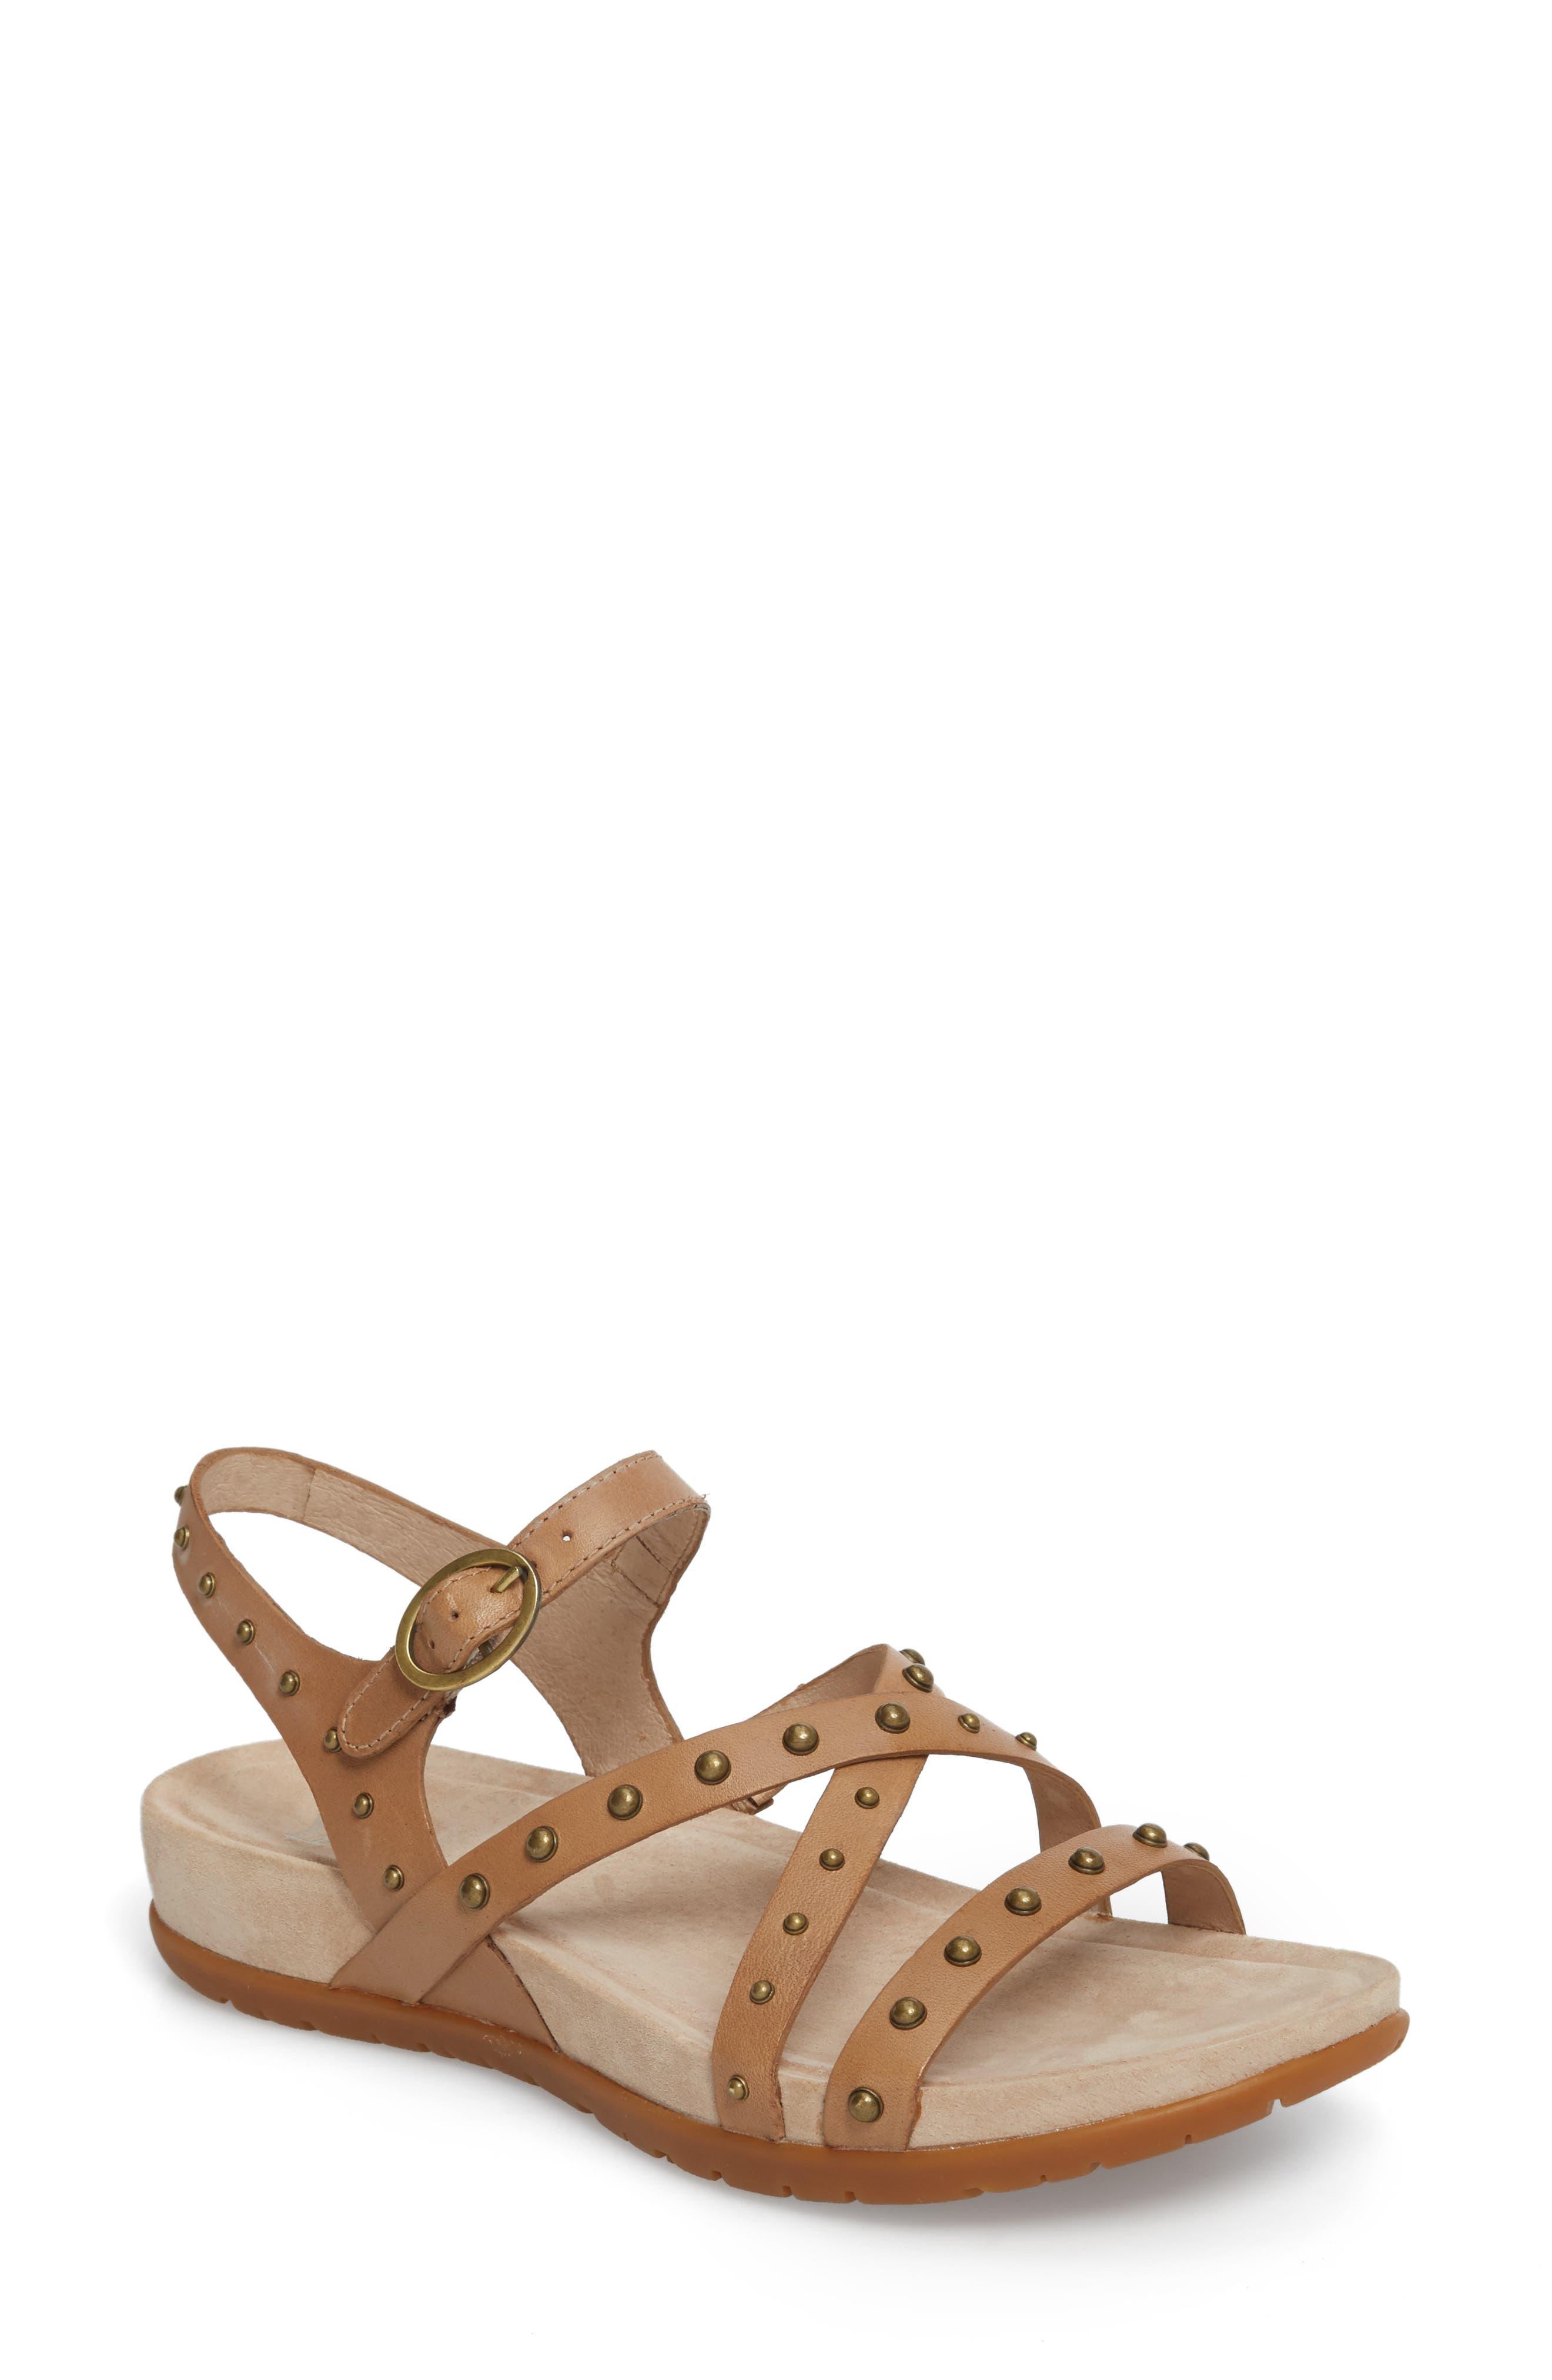 Brigitte Studded Strappy Sandal,                         Main,                         color, Sand Leather